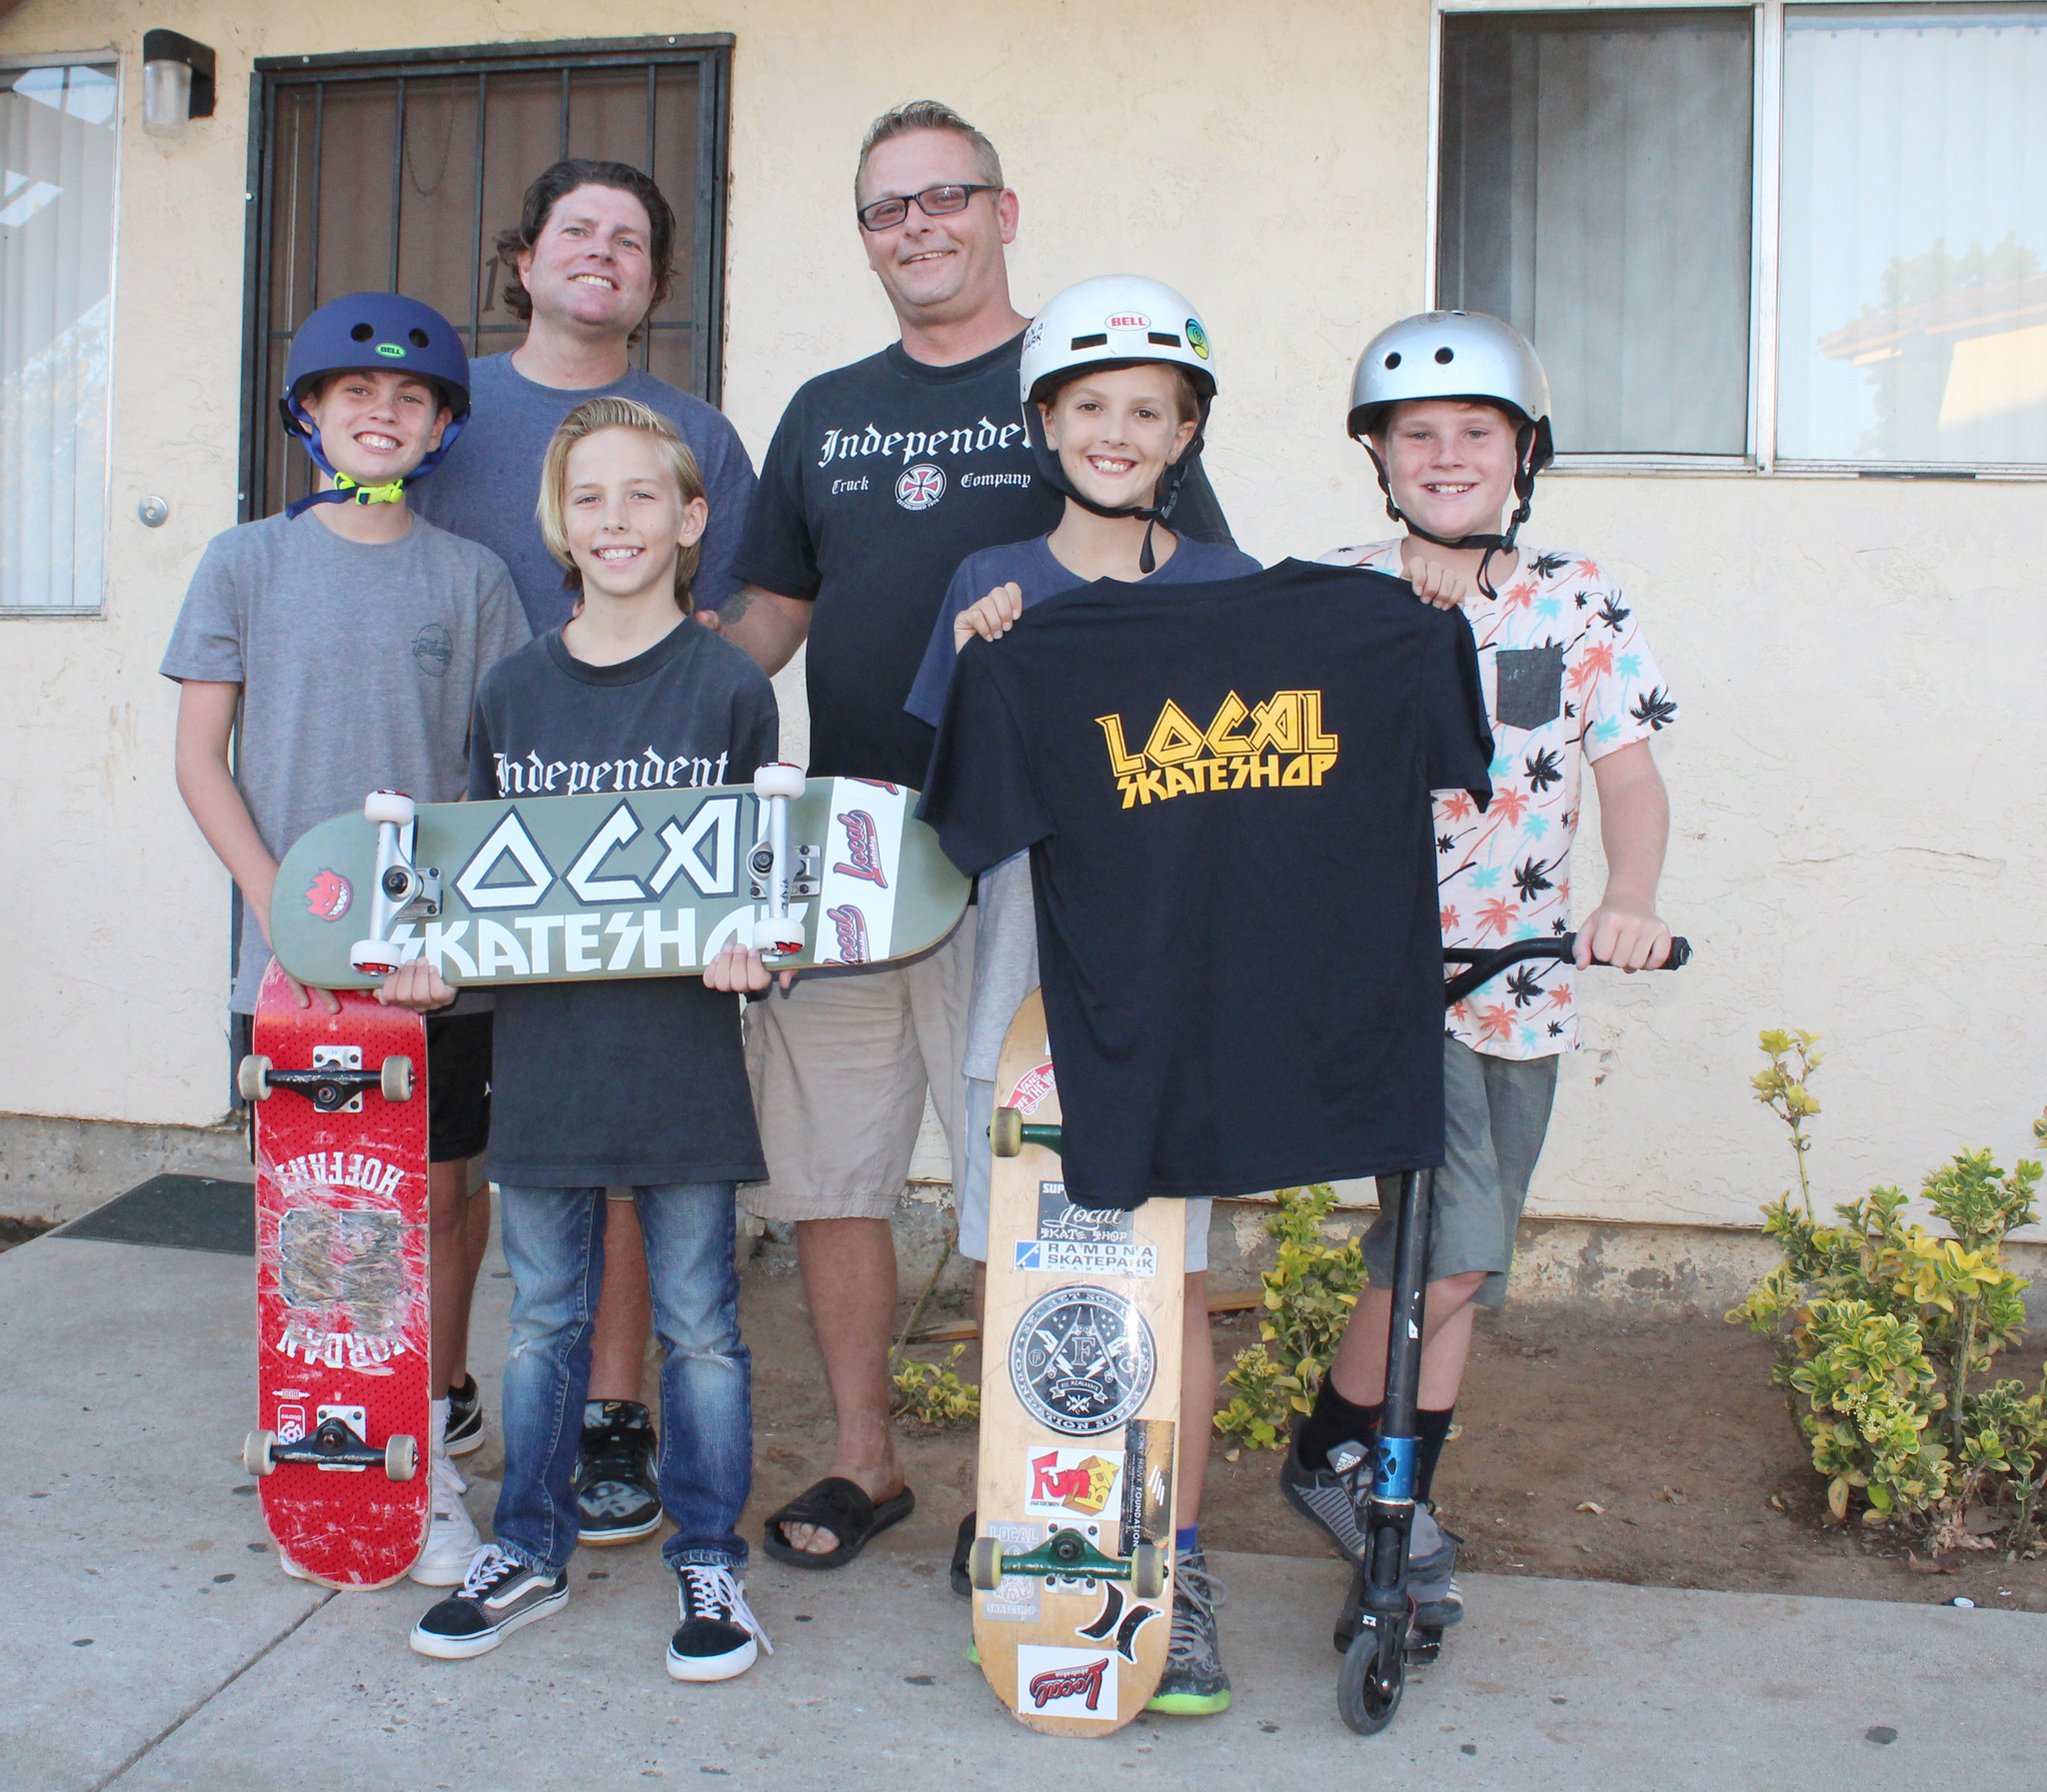 Andrew Hitt holds his new skateboard and Cash England holds Andrew's new Local Skateshop shirt. With them are Garin Sturgeon, Justin Sturgeon, Michael Hitt and Grayson Sturgeon.